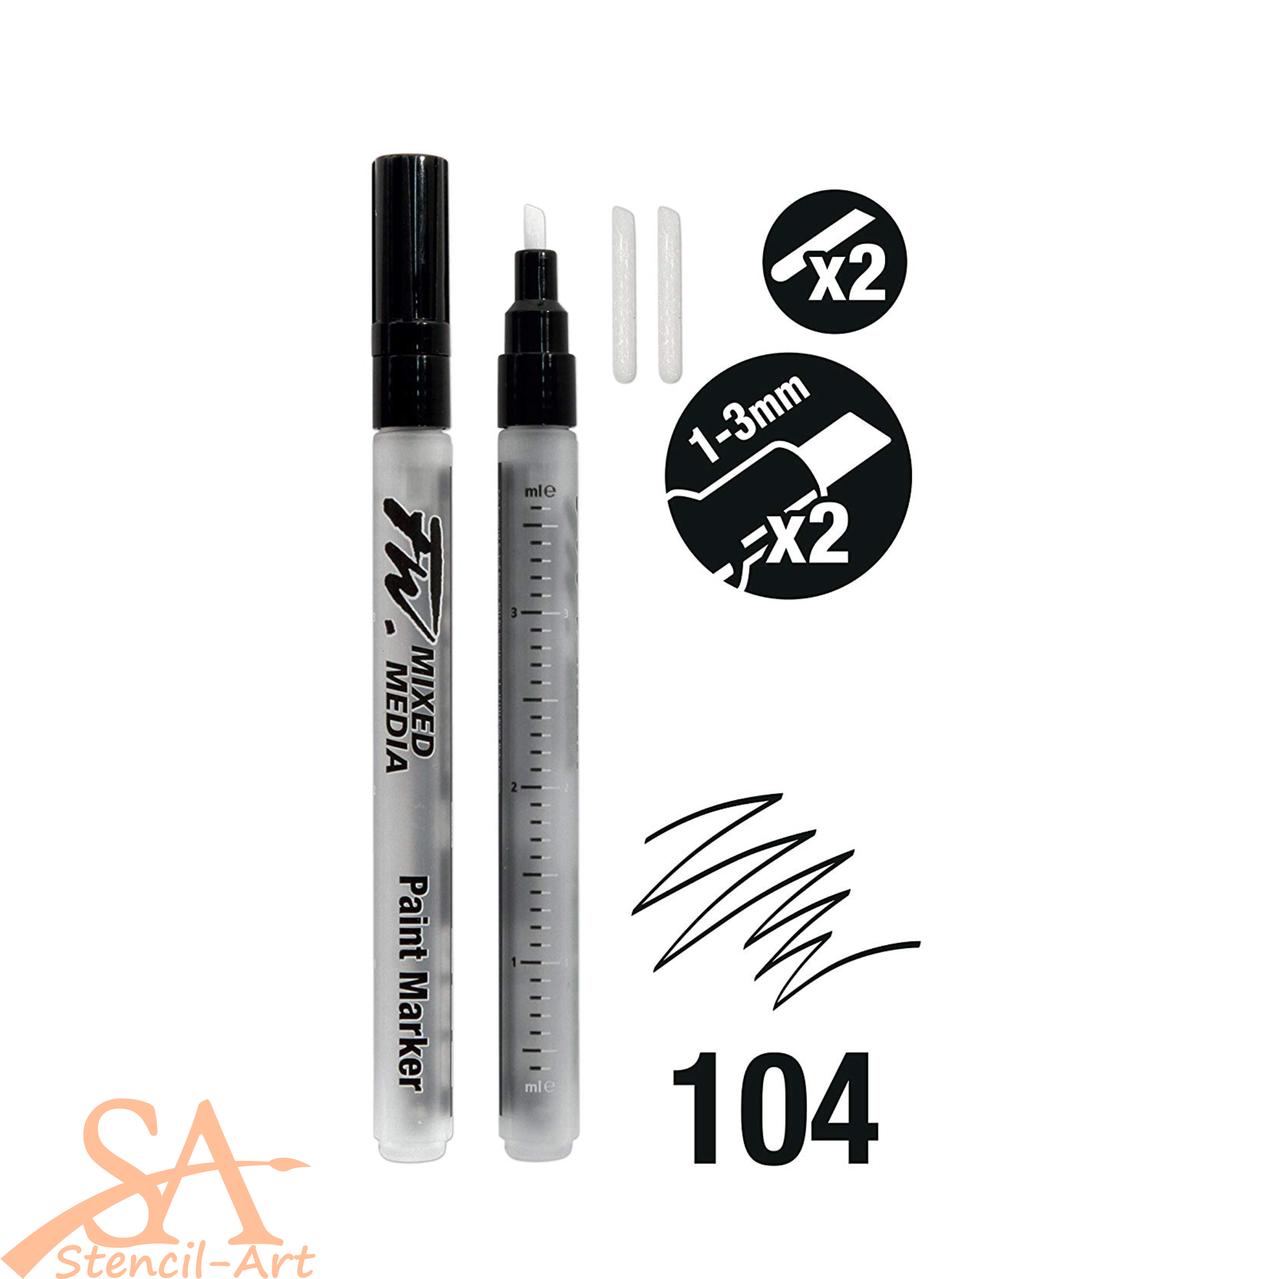 Daler-Rowney FW Empty Paint Markers -  Chisel Nib 1-3mm 2 Pcs